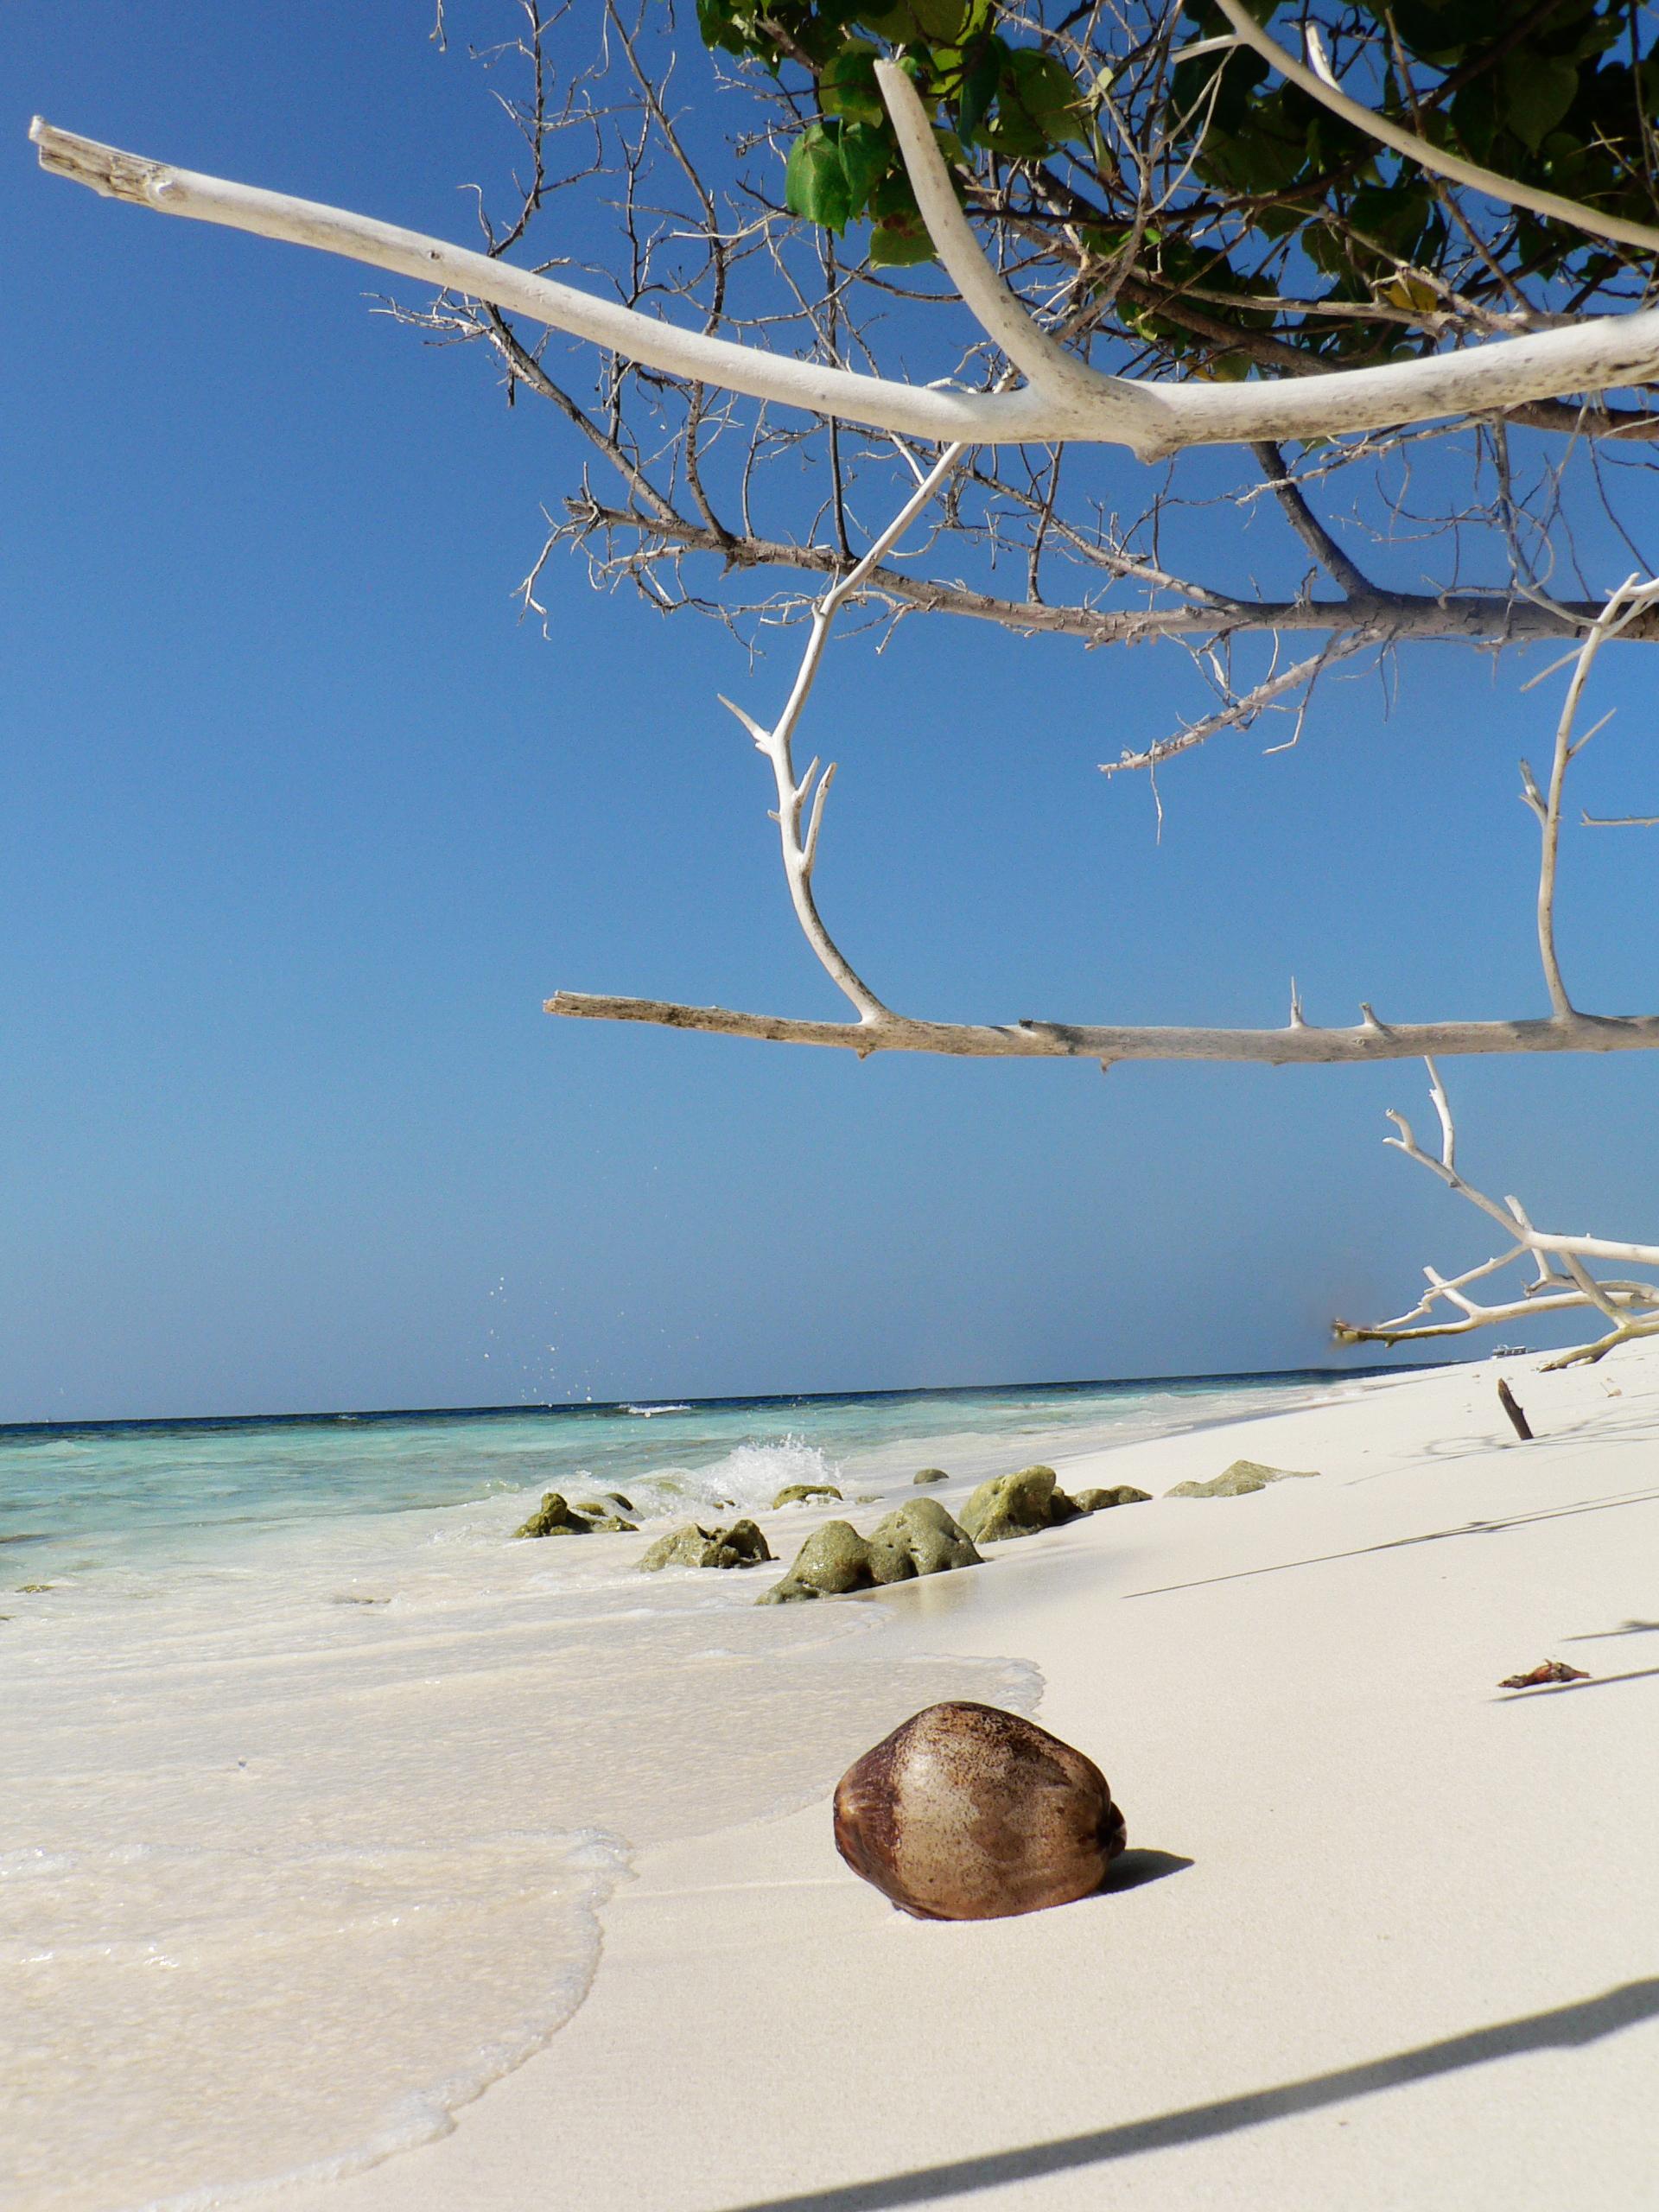 Strand der ABC Inseln Aruba Bonaire und Curacao